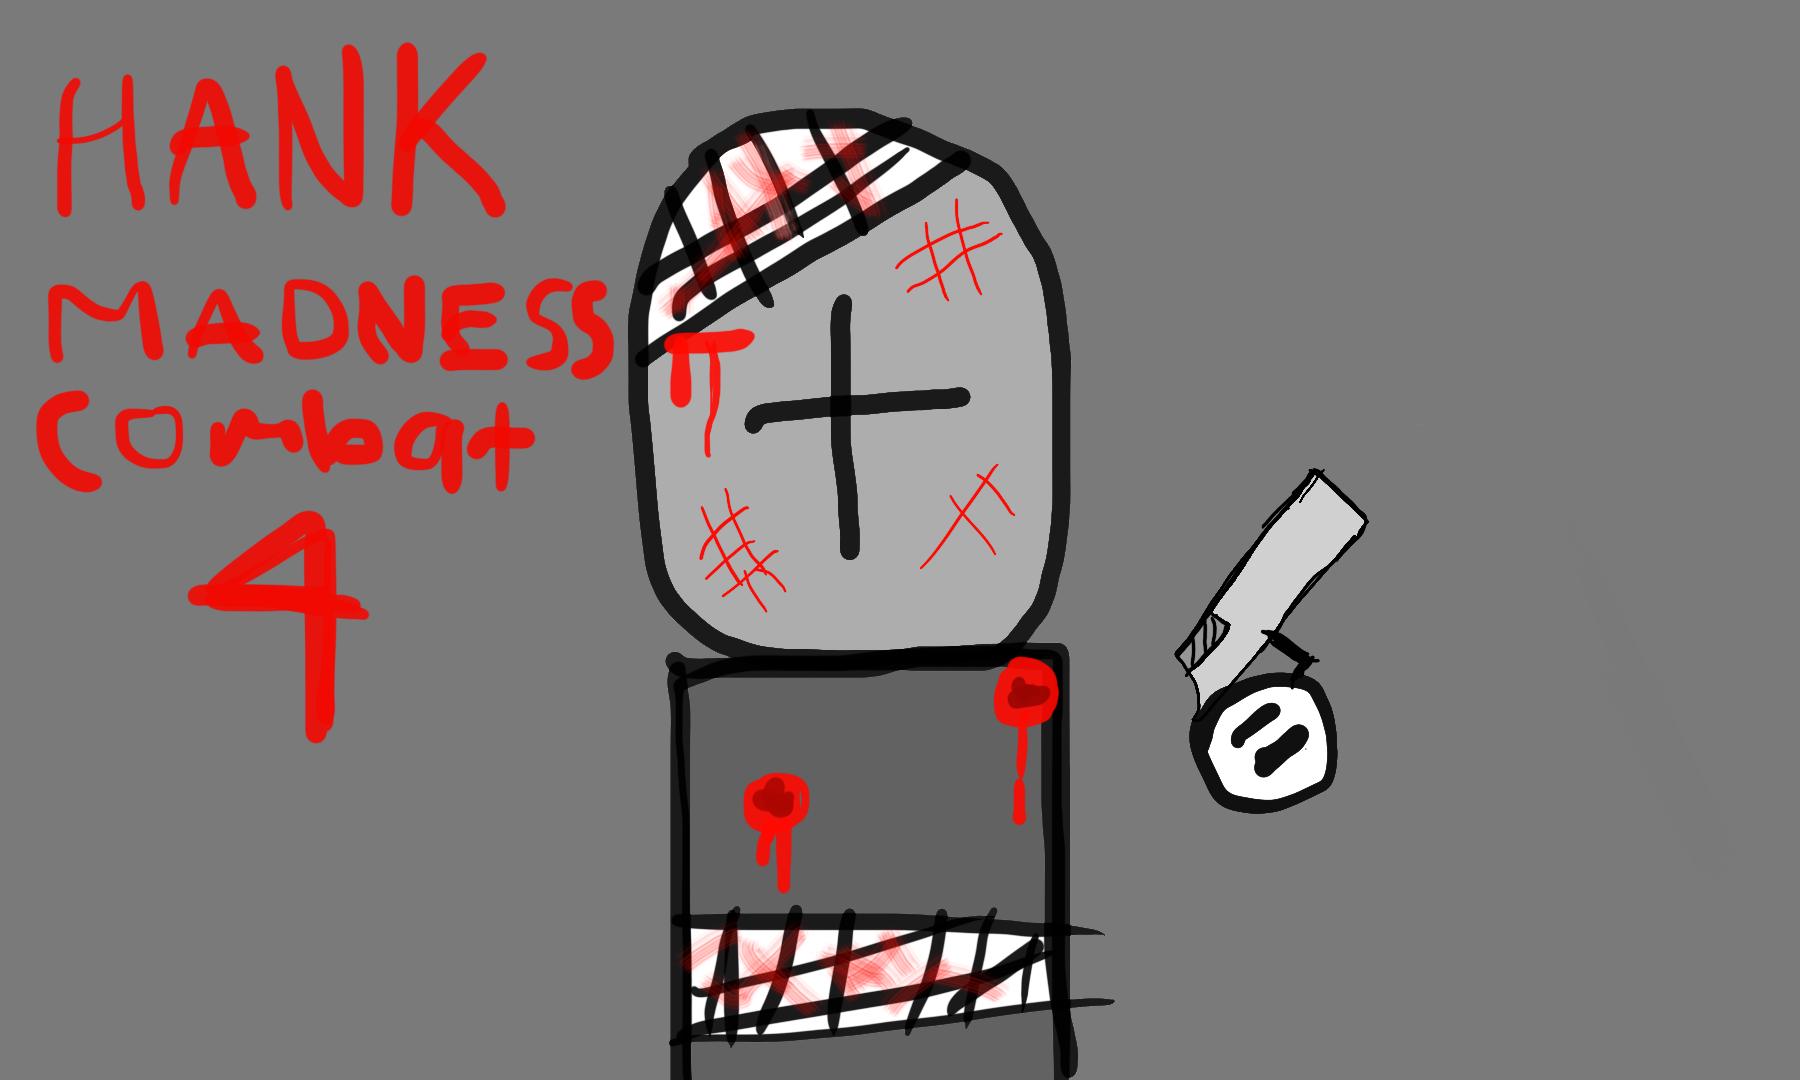 Hank madness combat 4